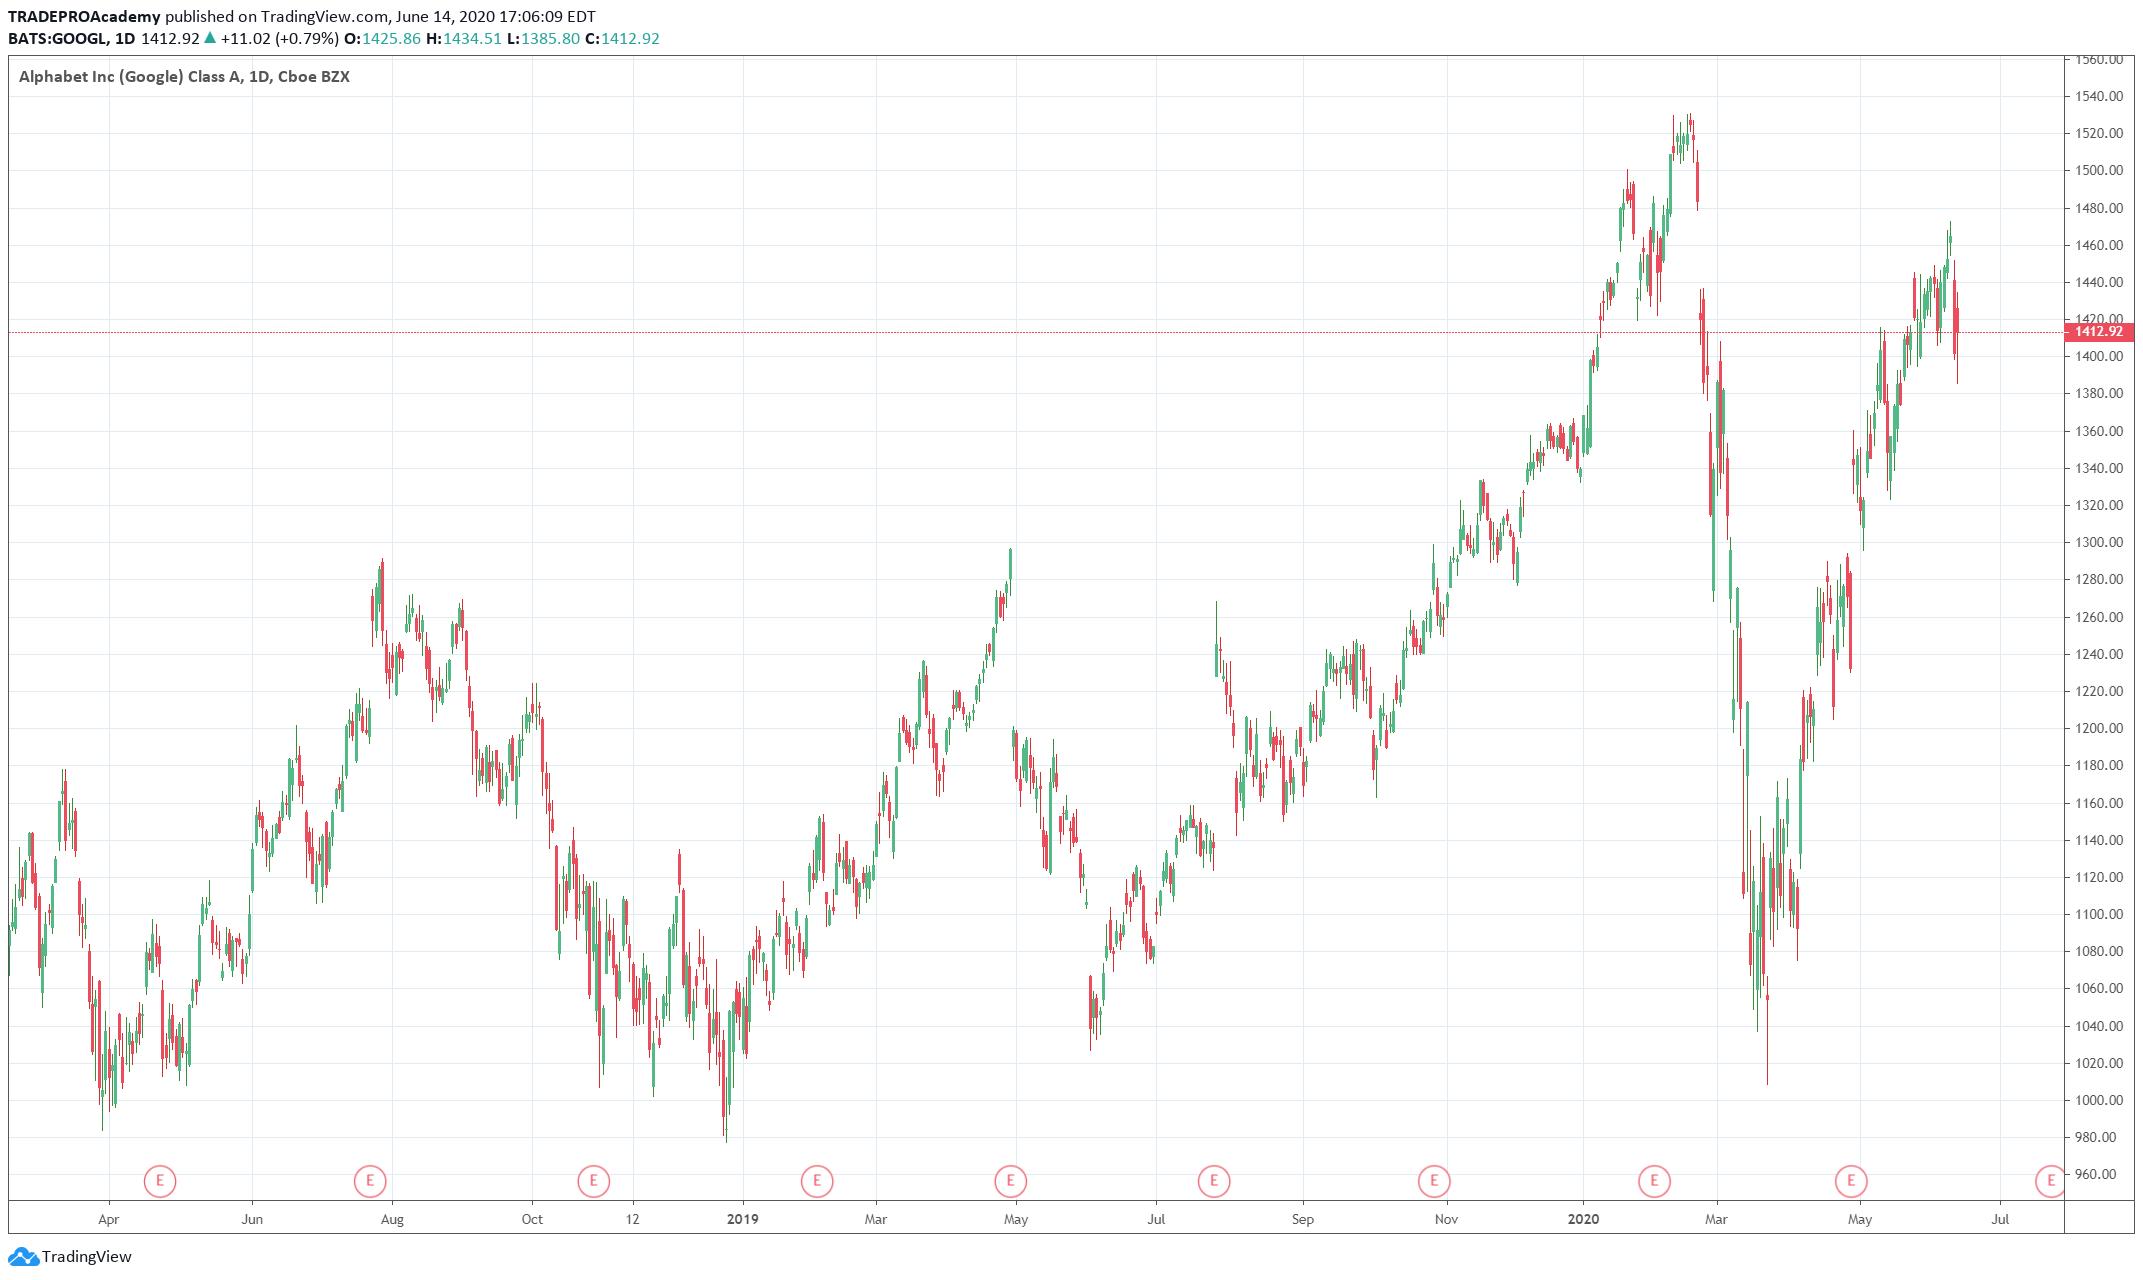 Alphabet (GOOGL) Stocks Flow Chart